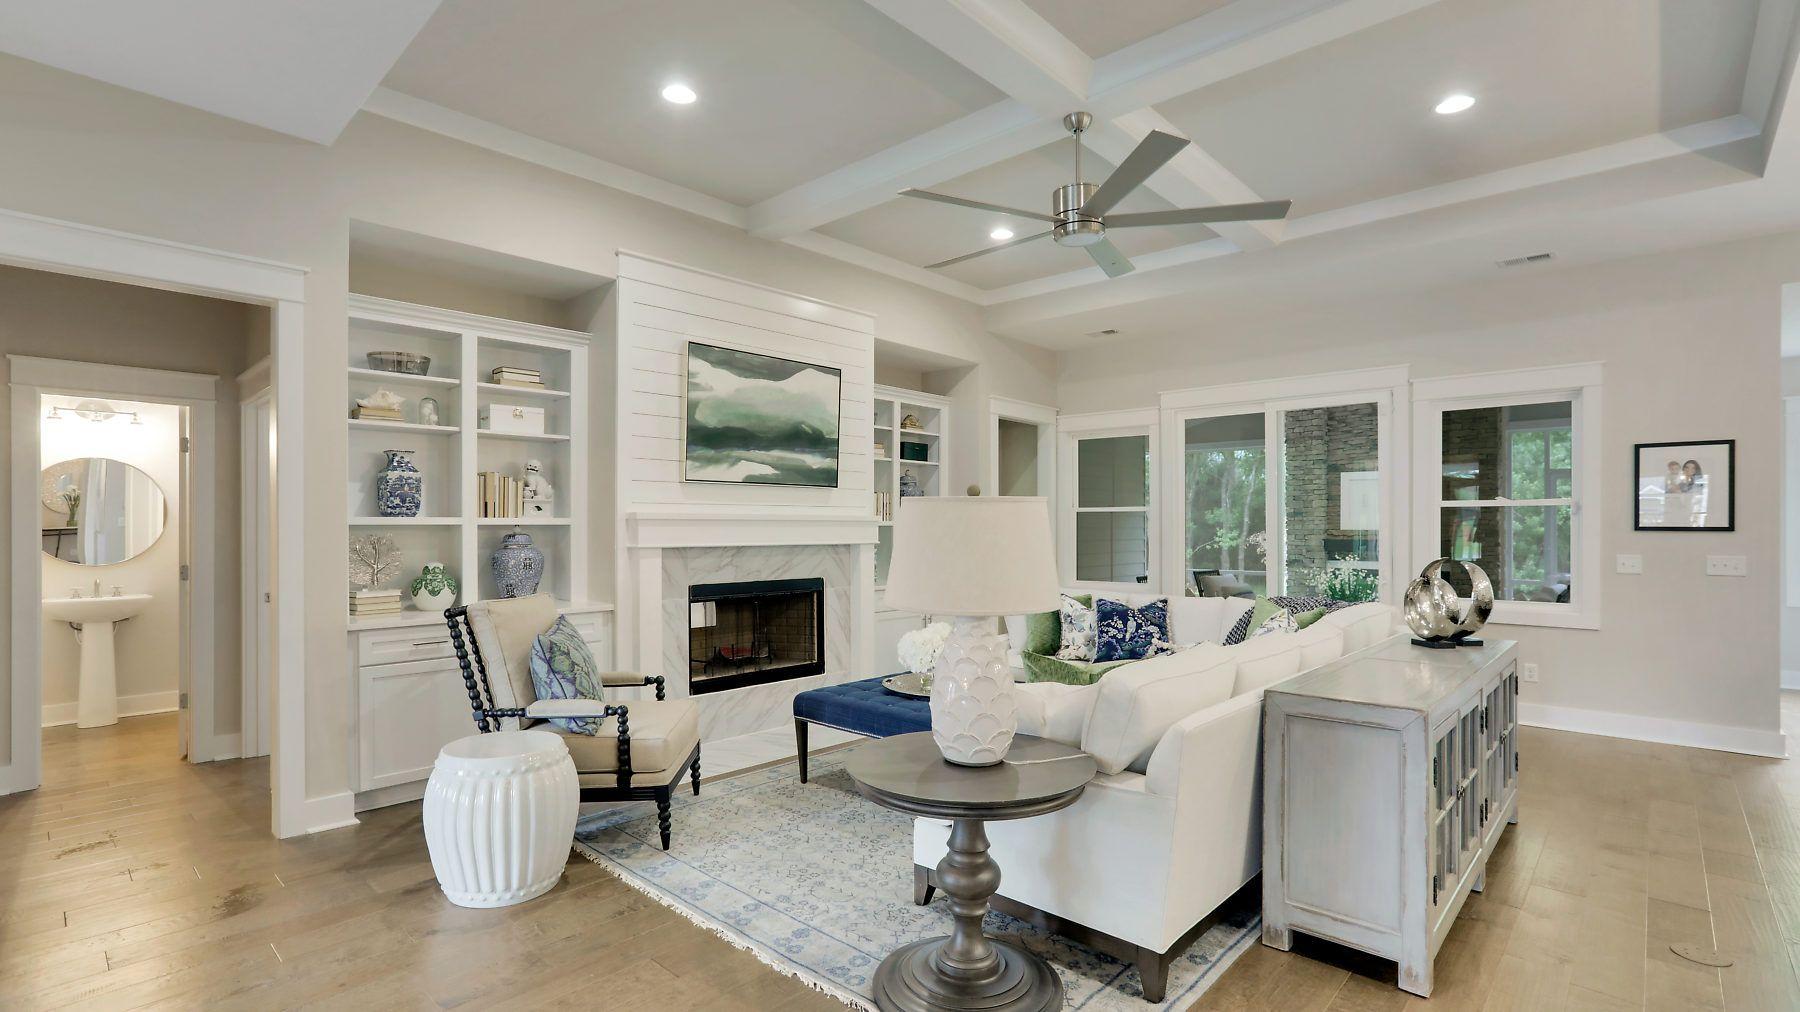 The Pinehurst Living Room:The Pinehurst Living Room